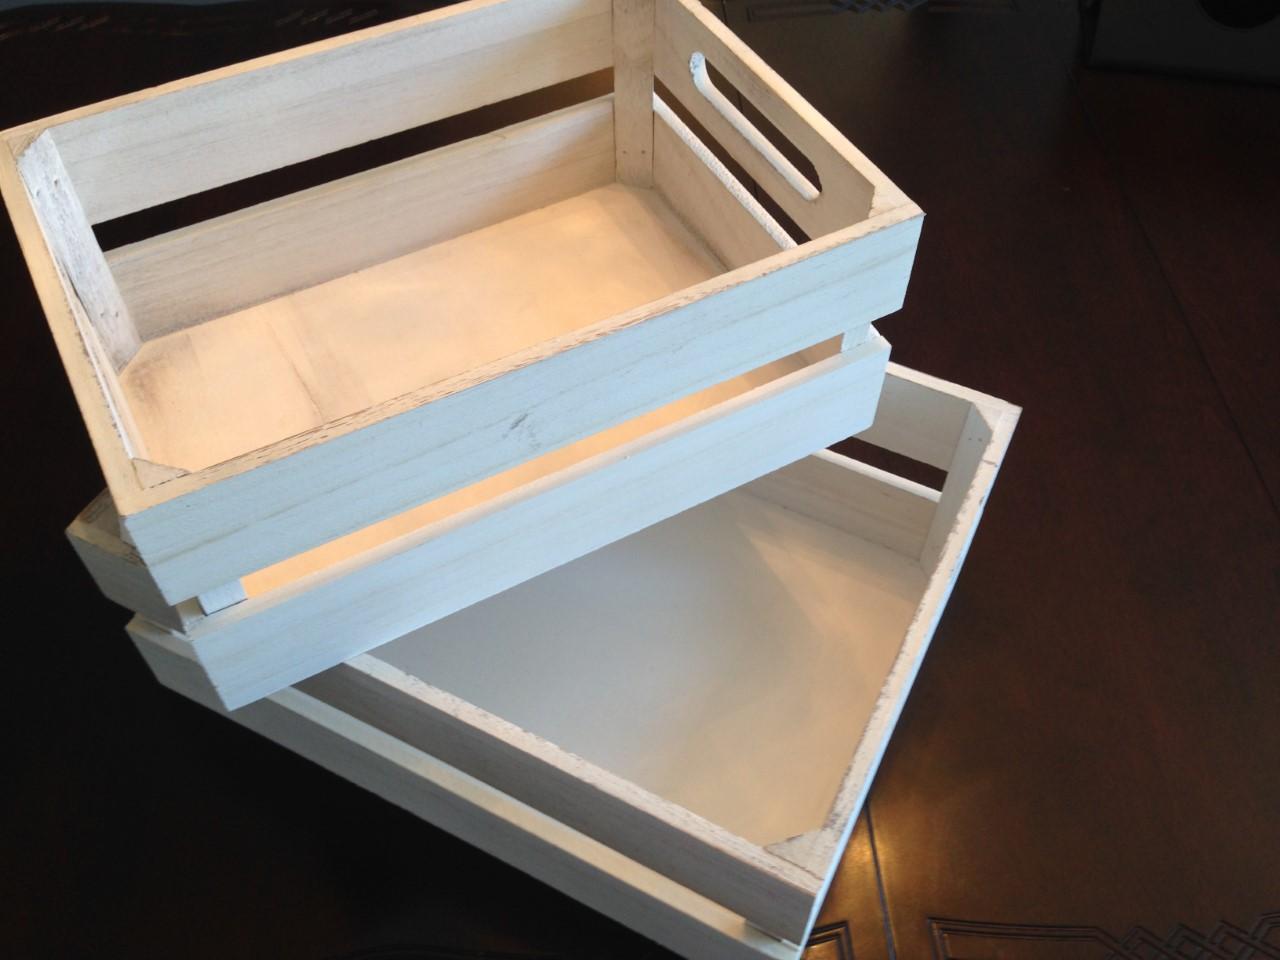 location d co plus. Black Bedroom Furniture Sets. Home Design Ideas